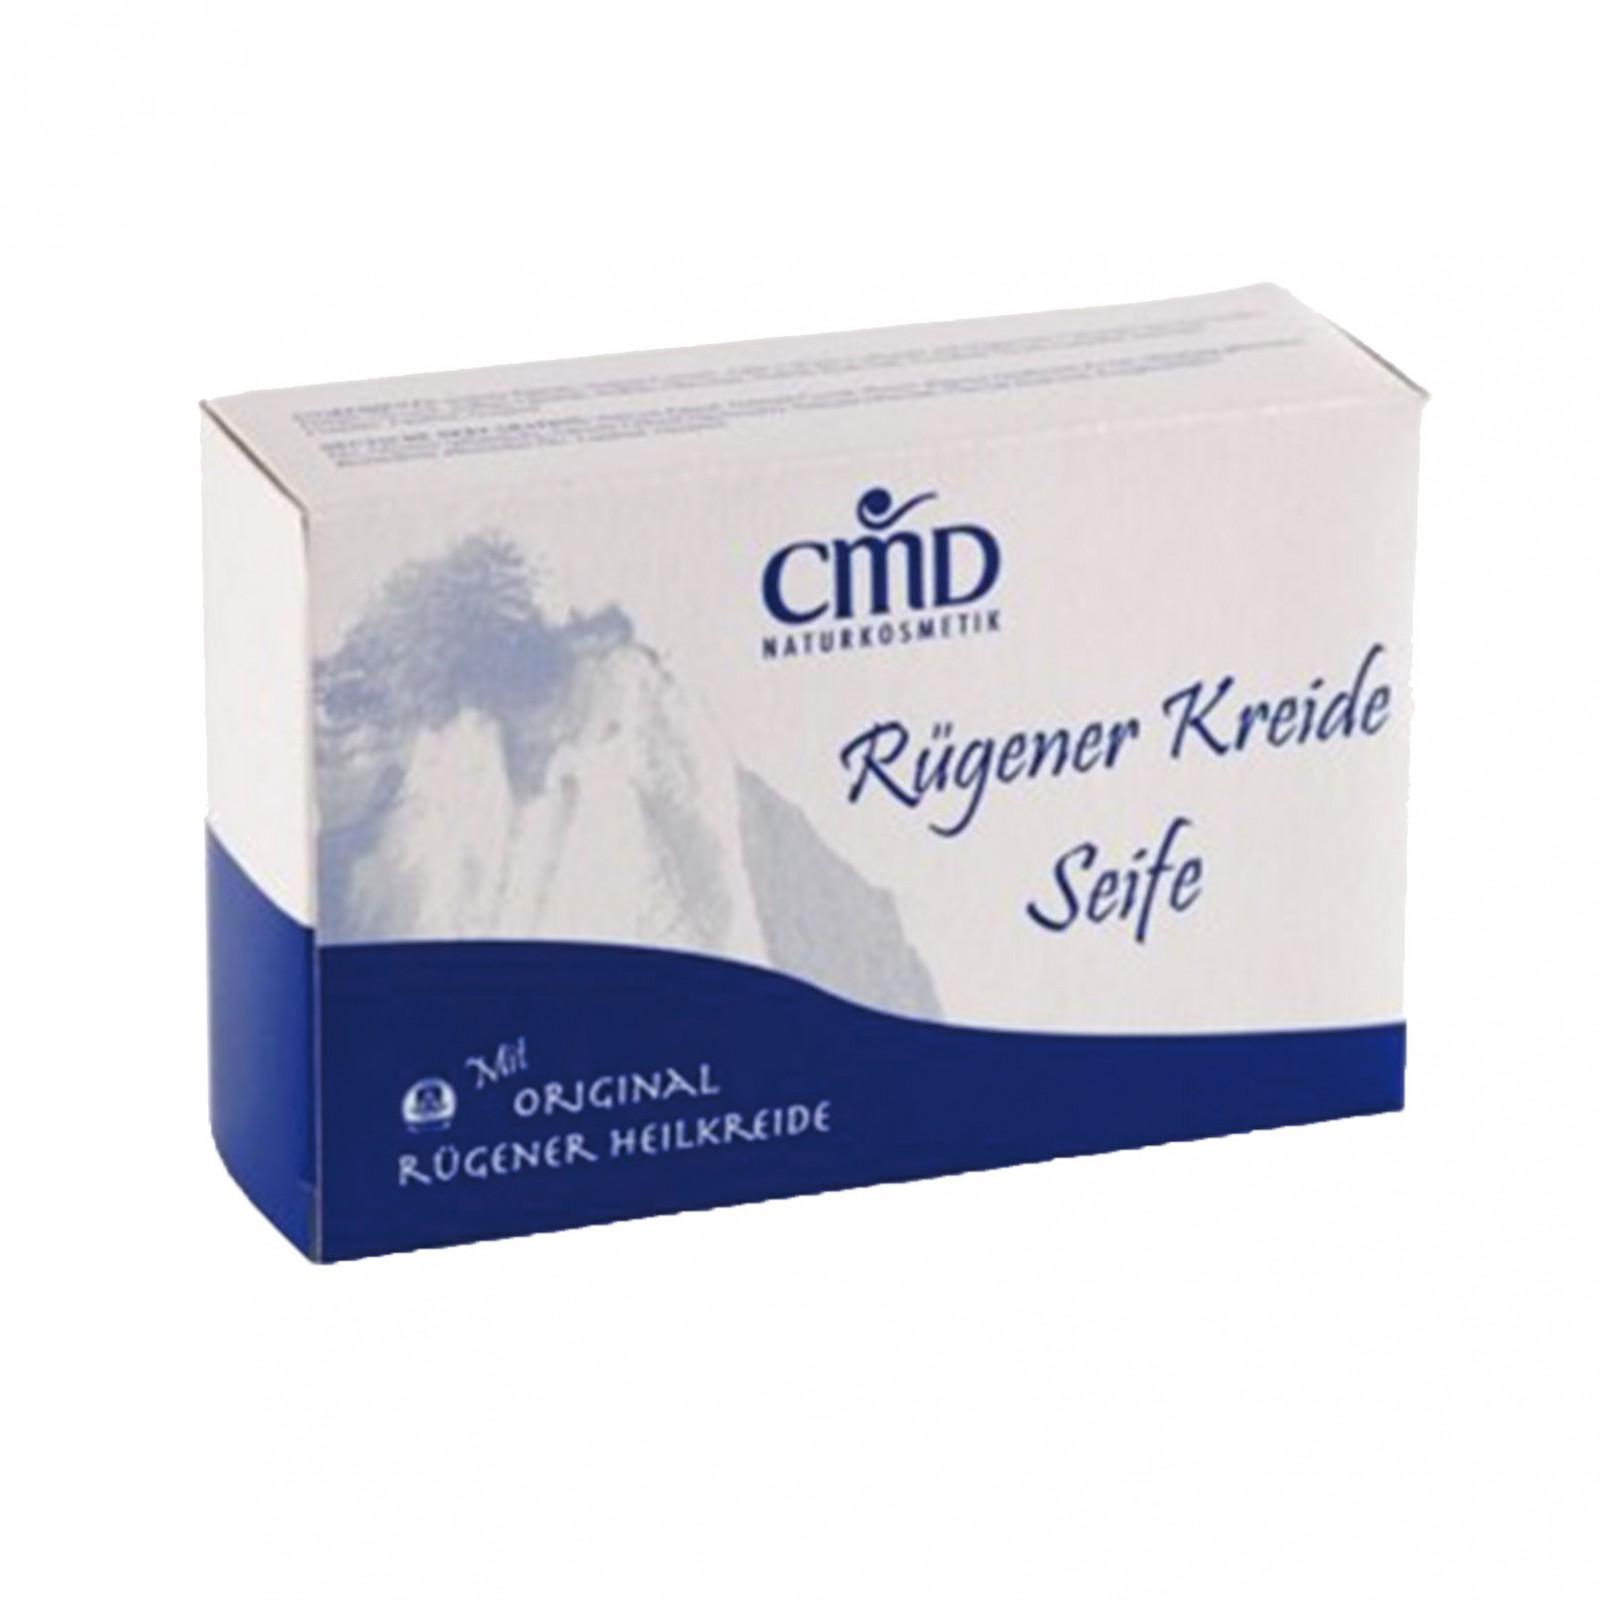 R'gener Kreide Seife 100 g - pH 10,0